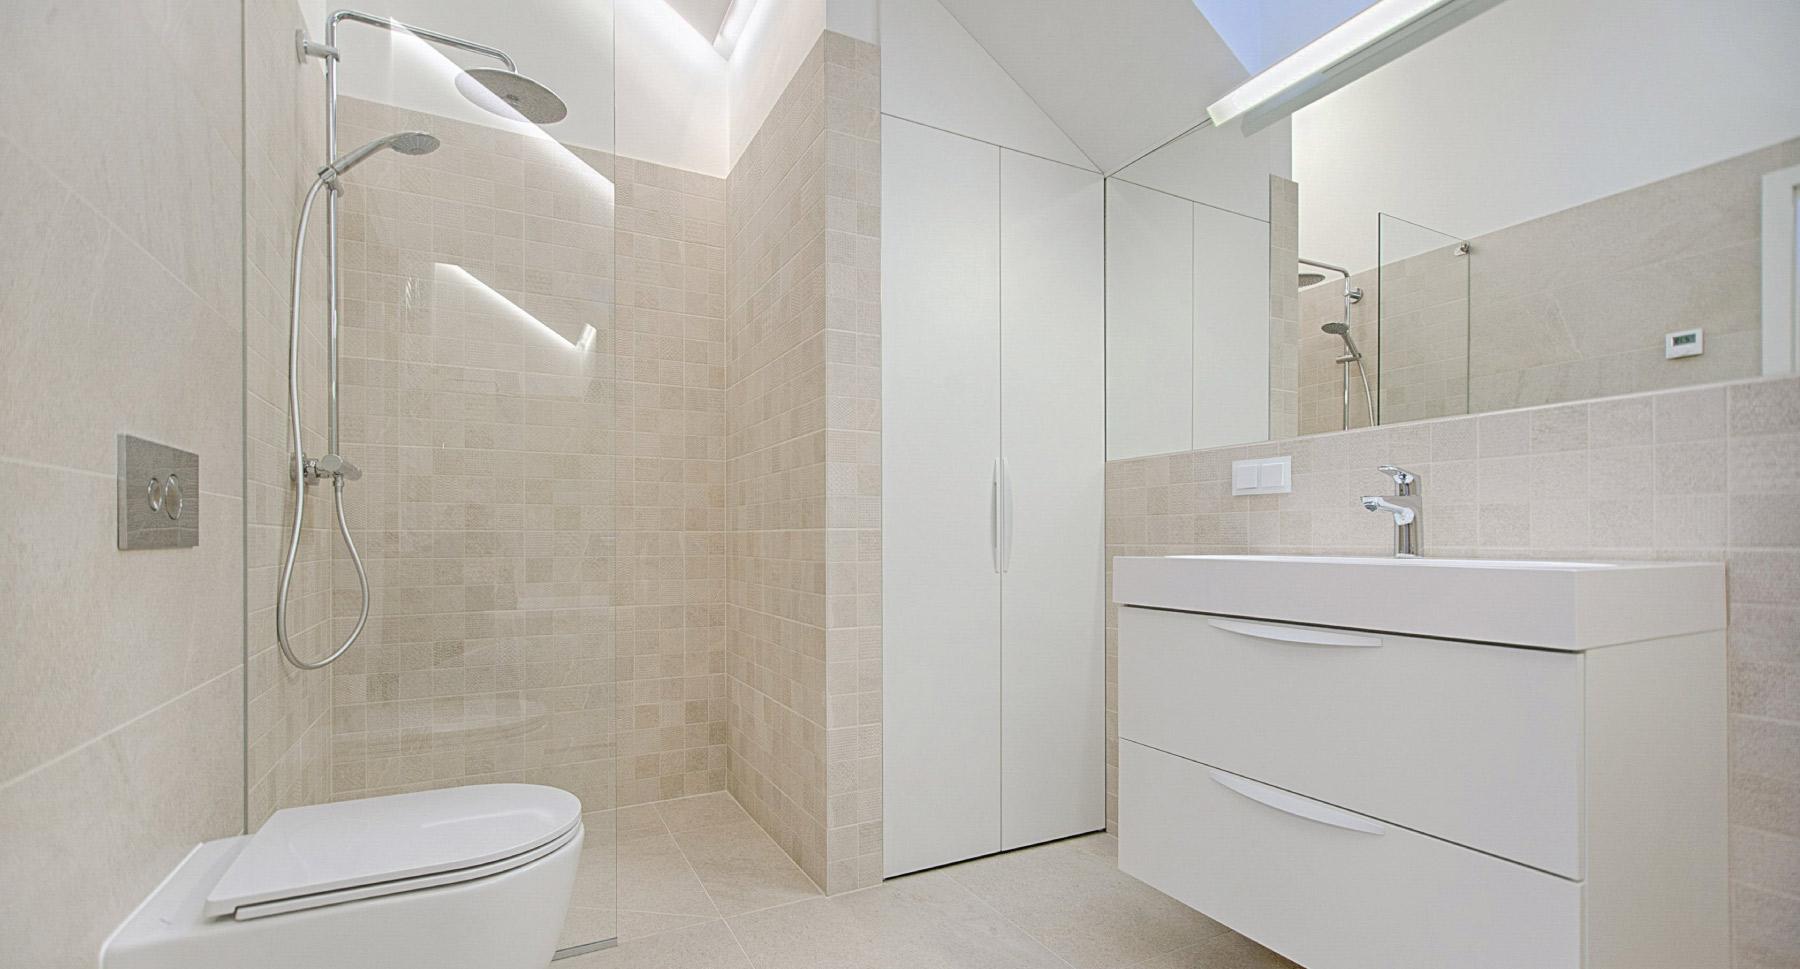 Bathroom renovation in London